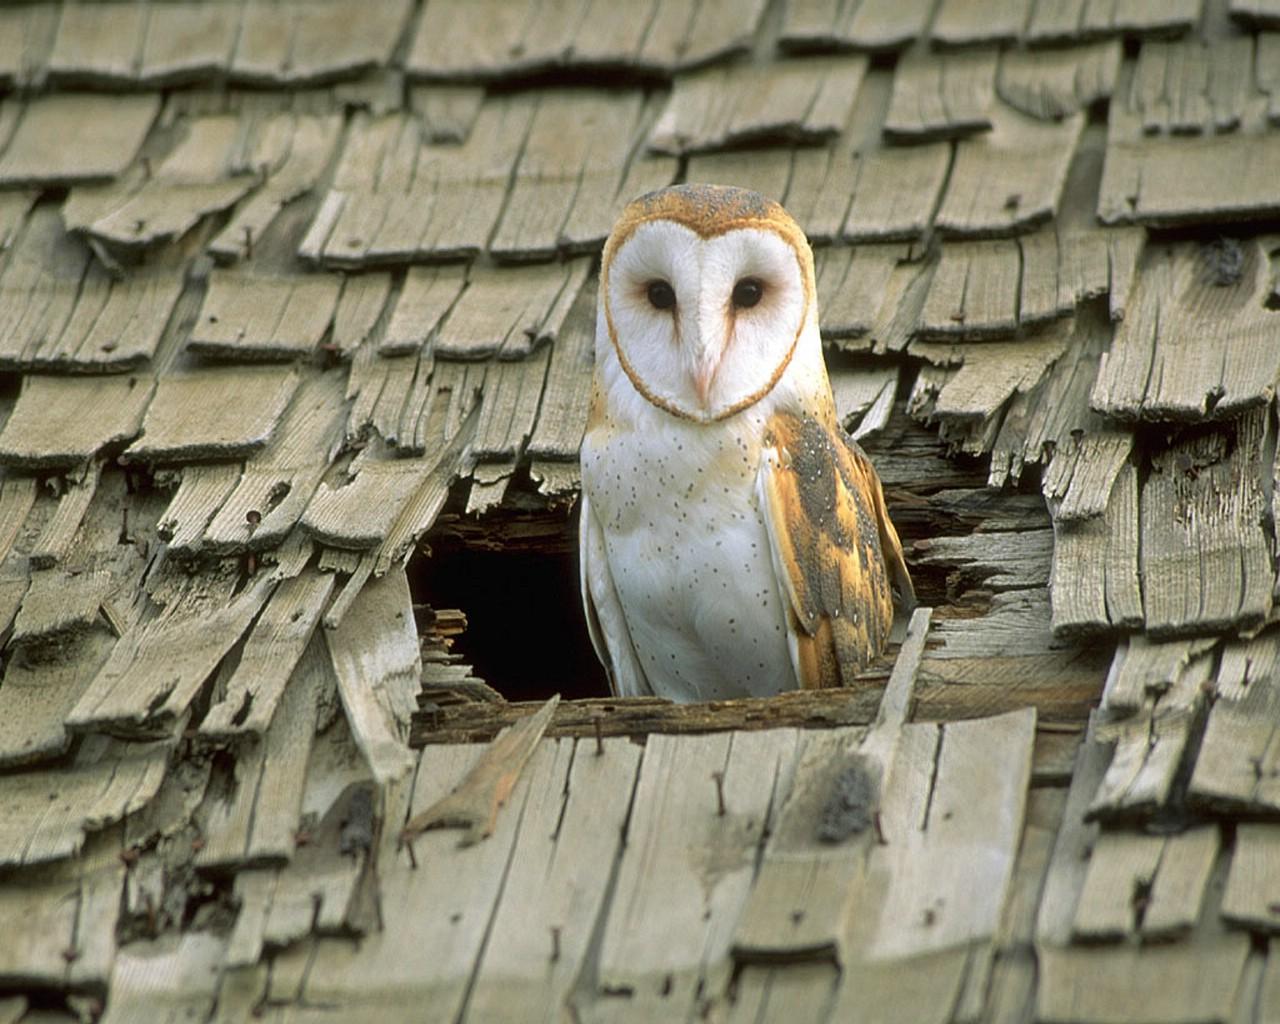 barn owls in a barn - photo #39